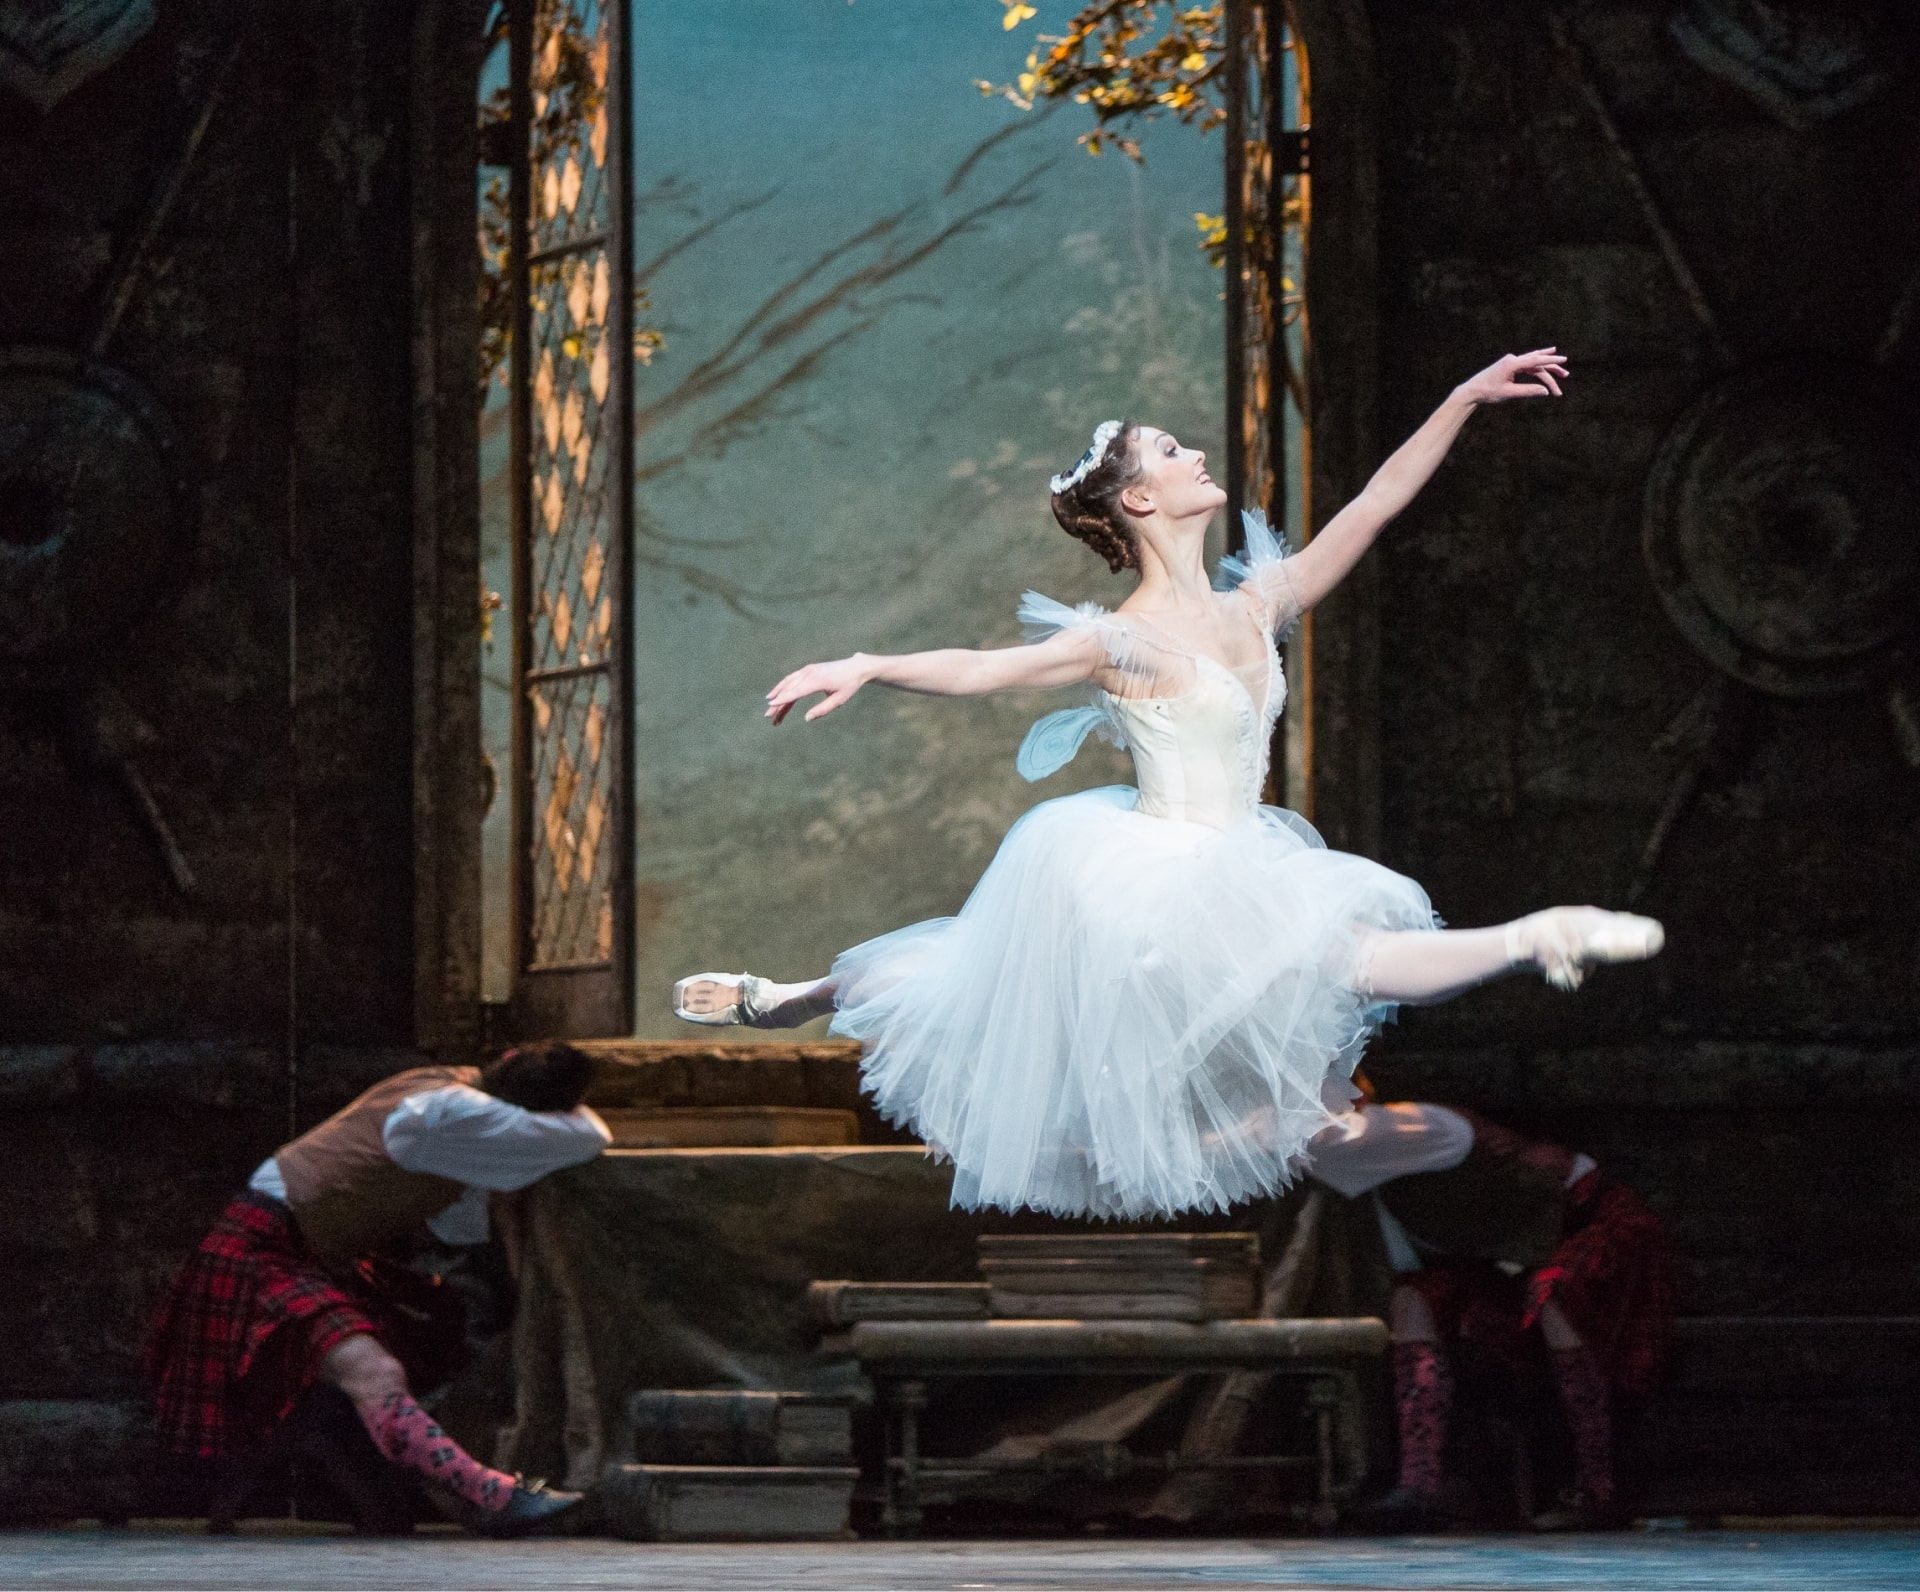 Ballerina in white dress leaps across stage unseen by sleeping dancer below open paned window.